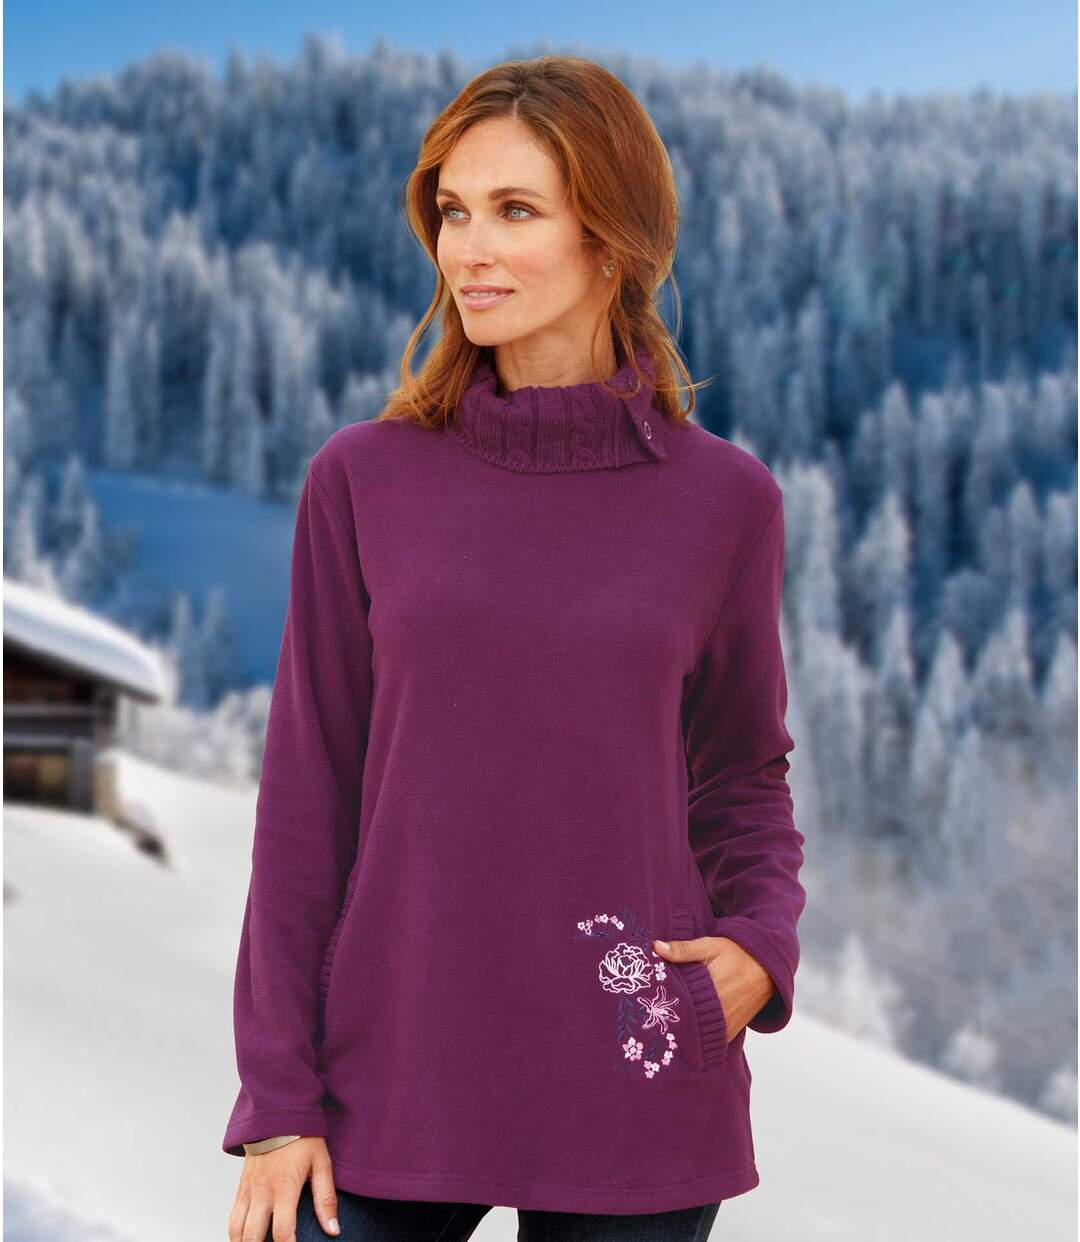 Tunika-Pullover aus Microfleece